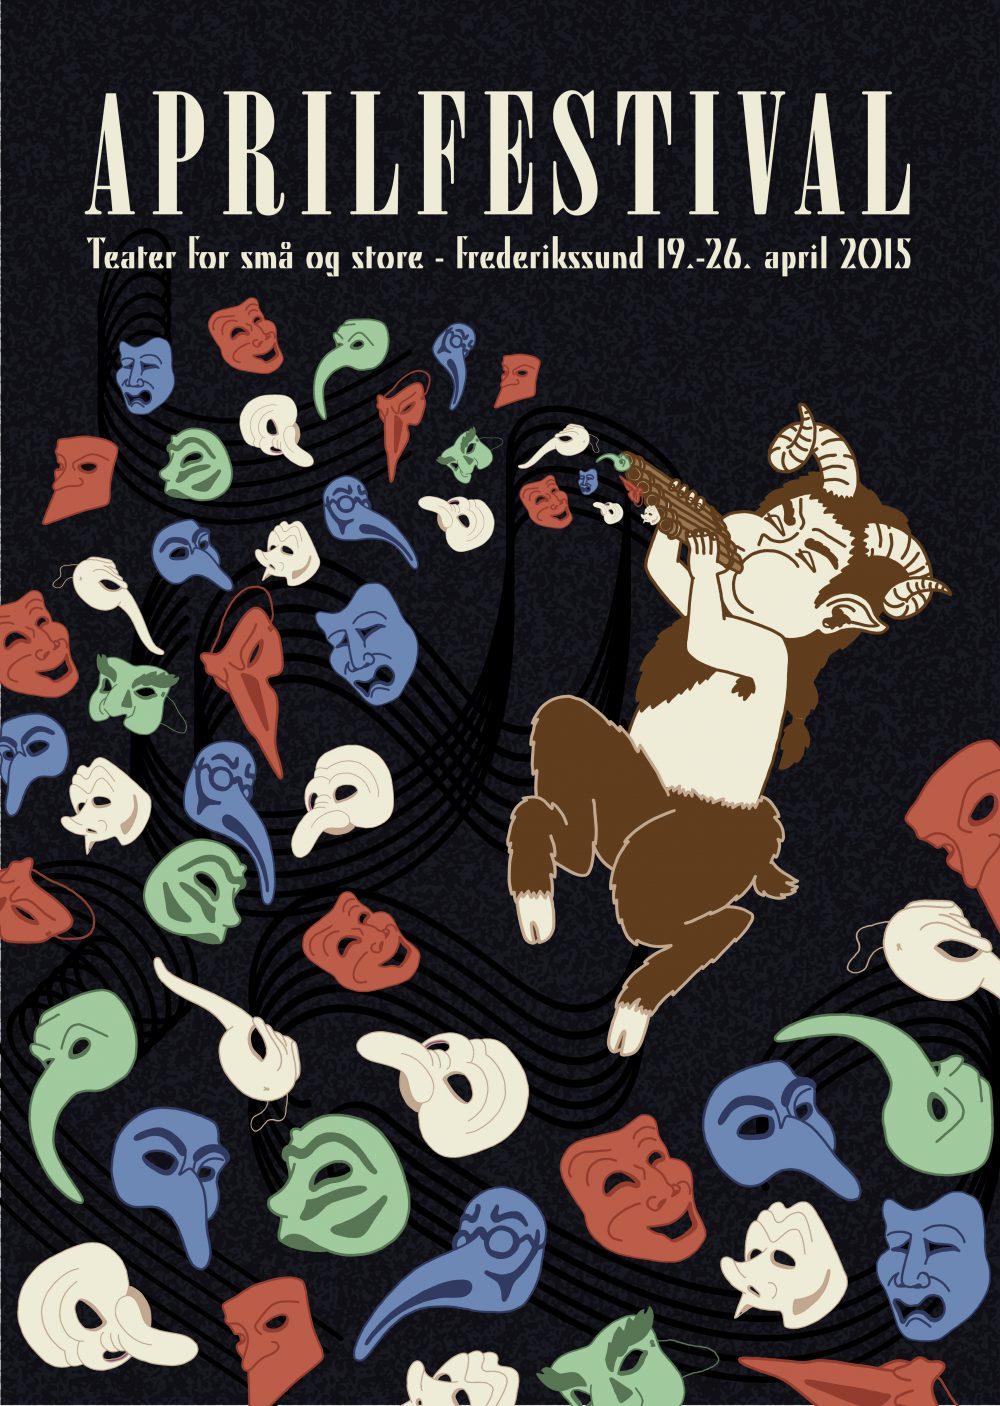 plakat aprilfestival